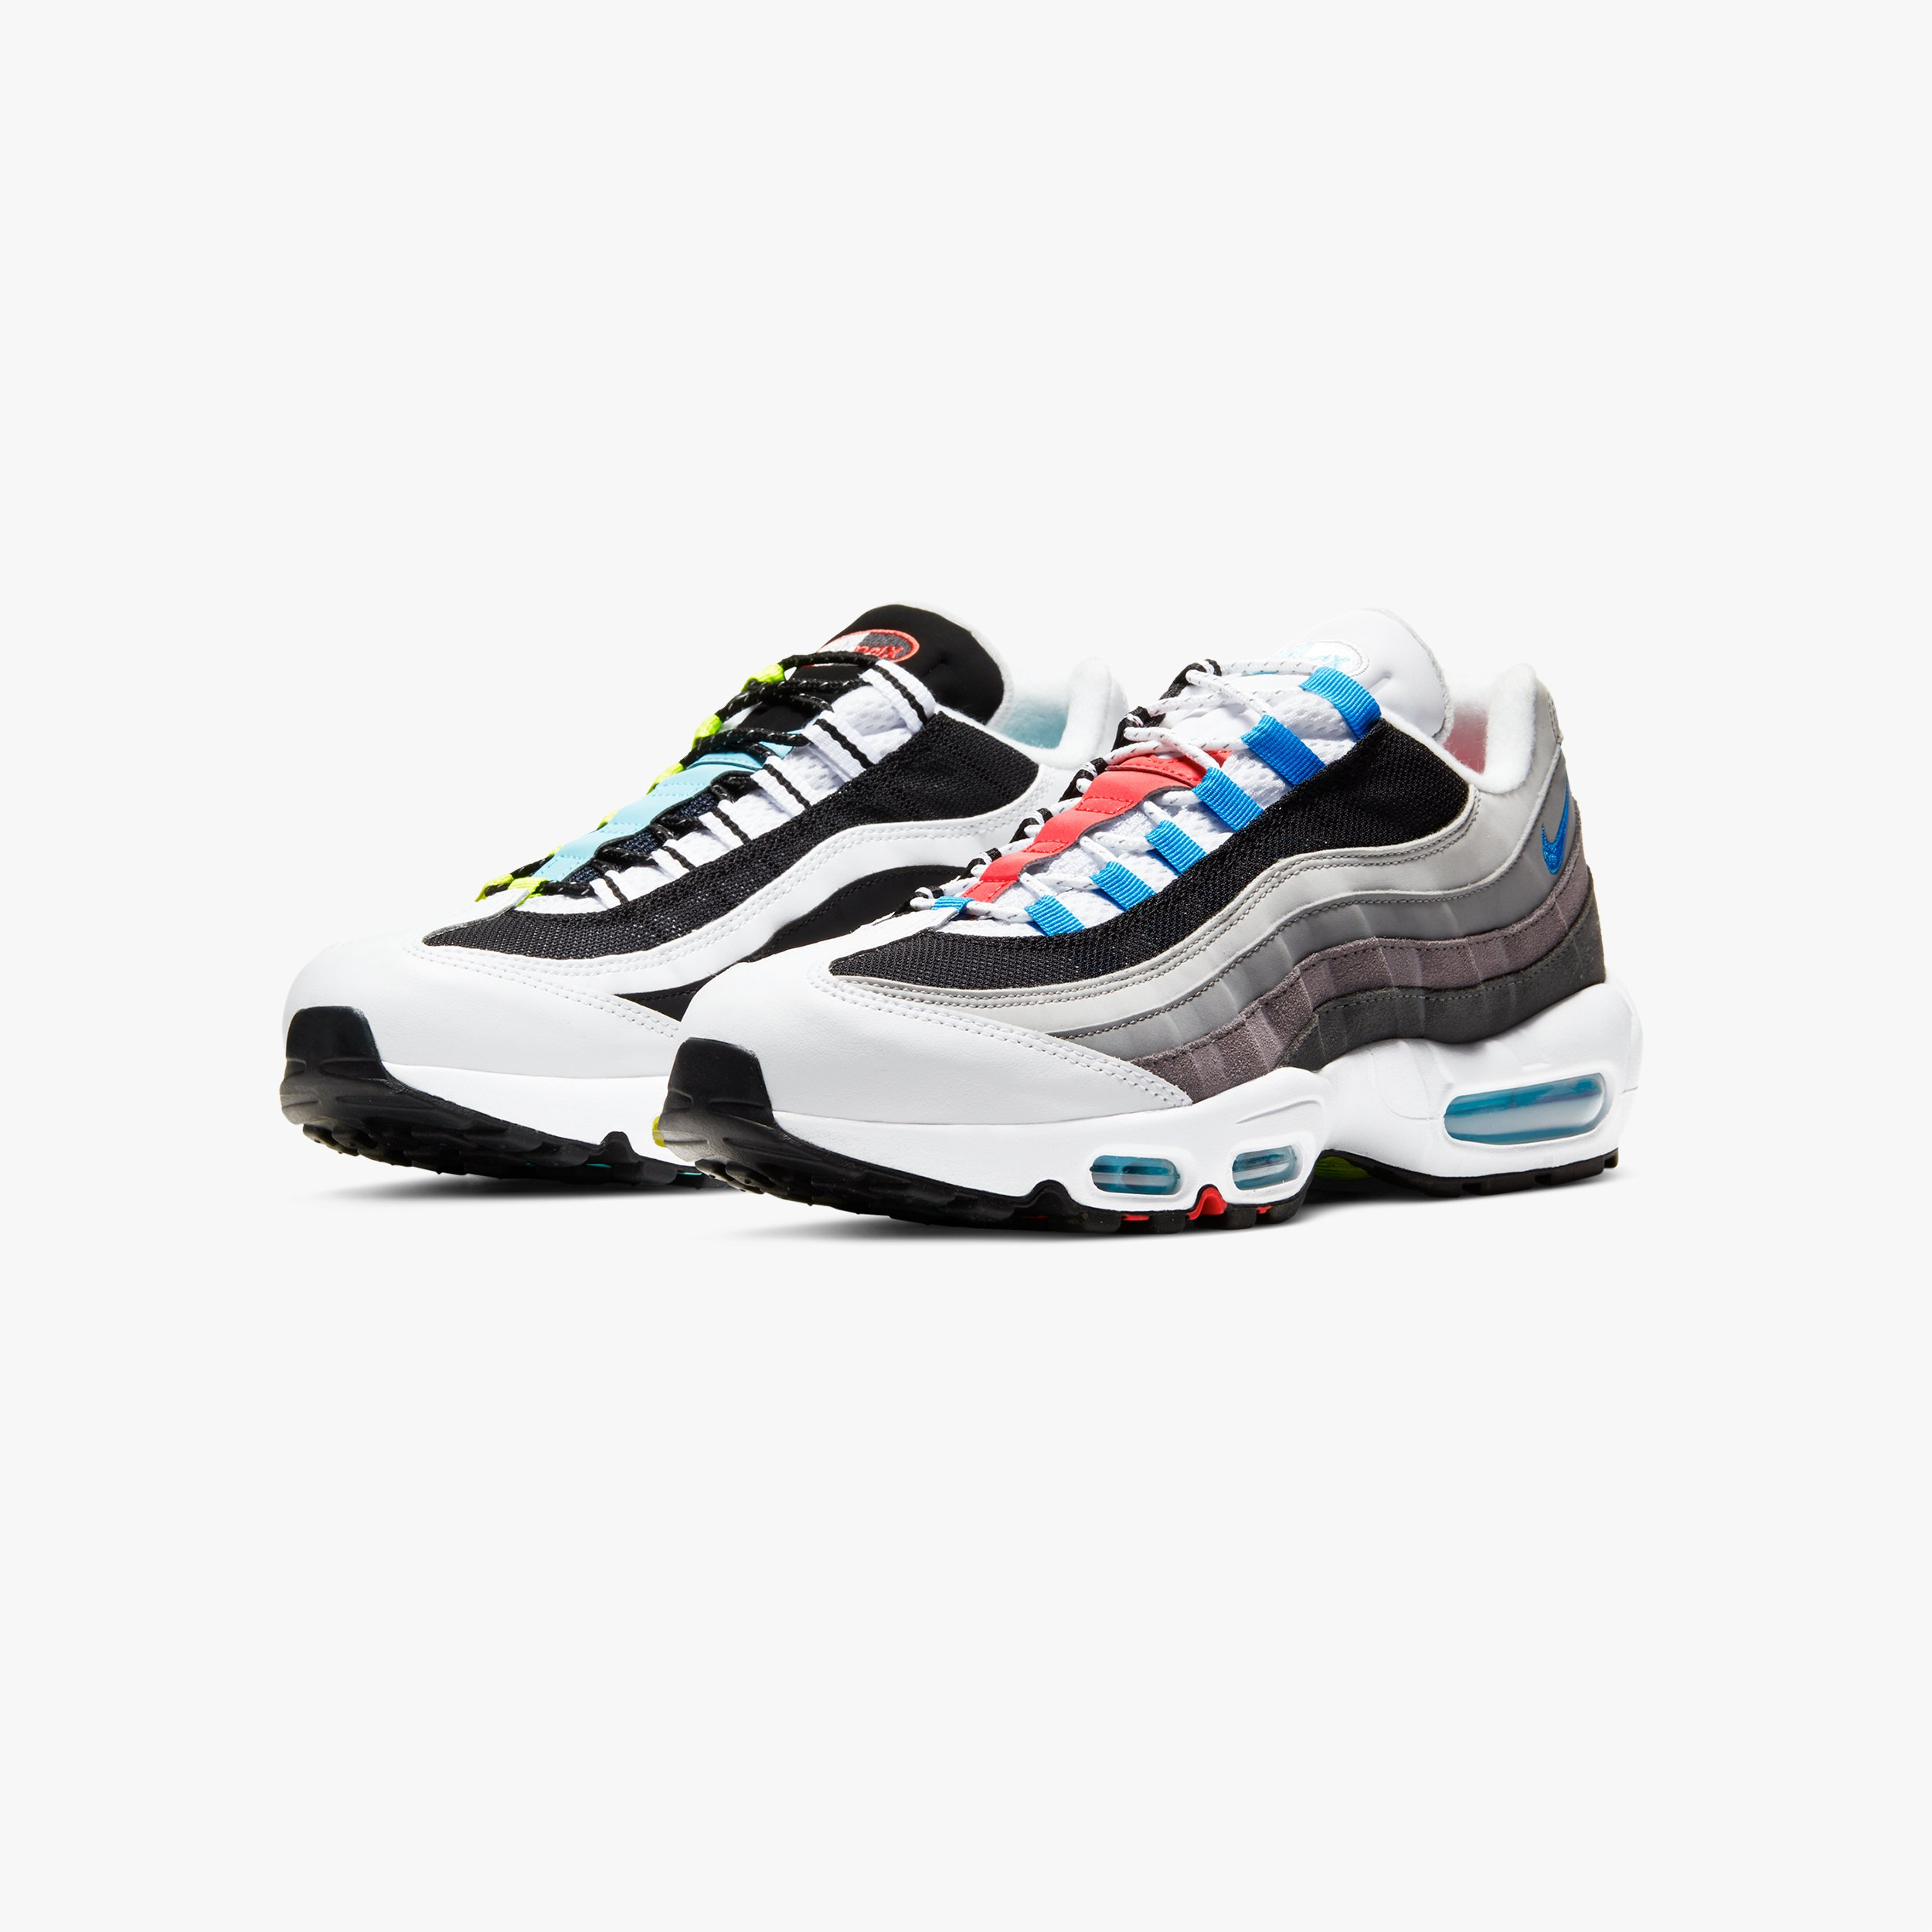 Nike Air Max 95 QS - Cj0589-001 - SNS | sneakers & streetwear ...